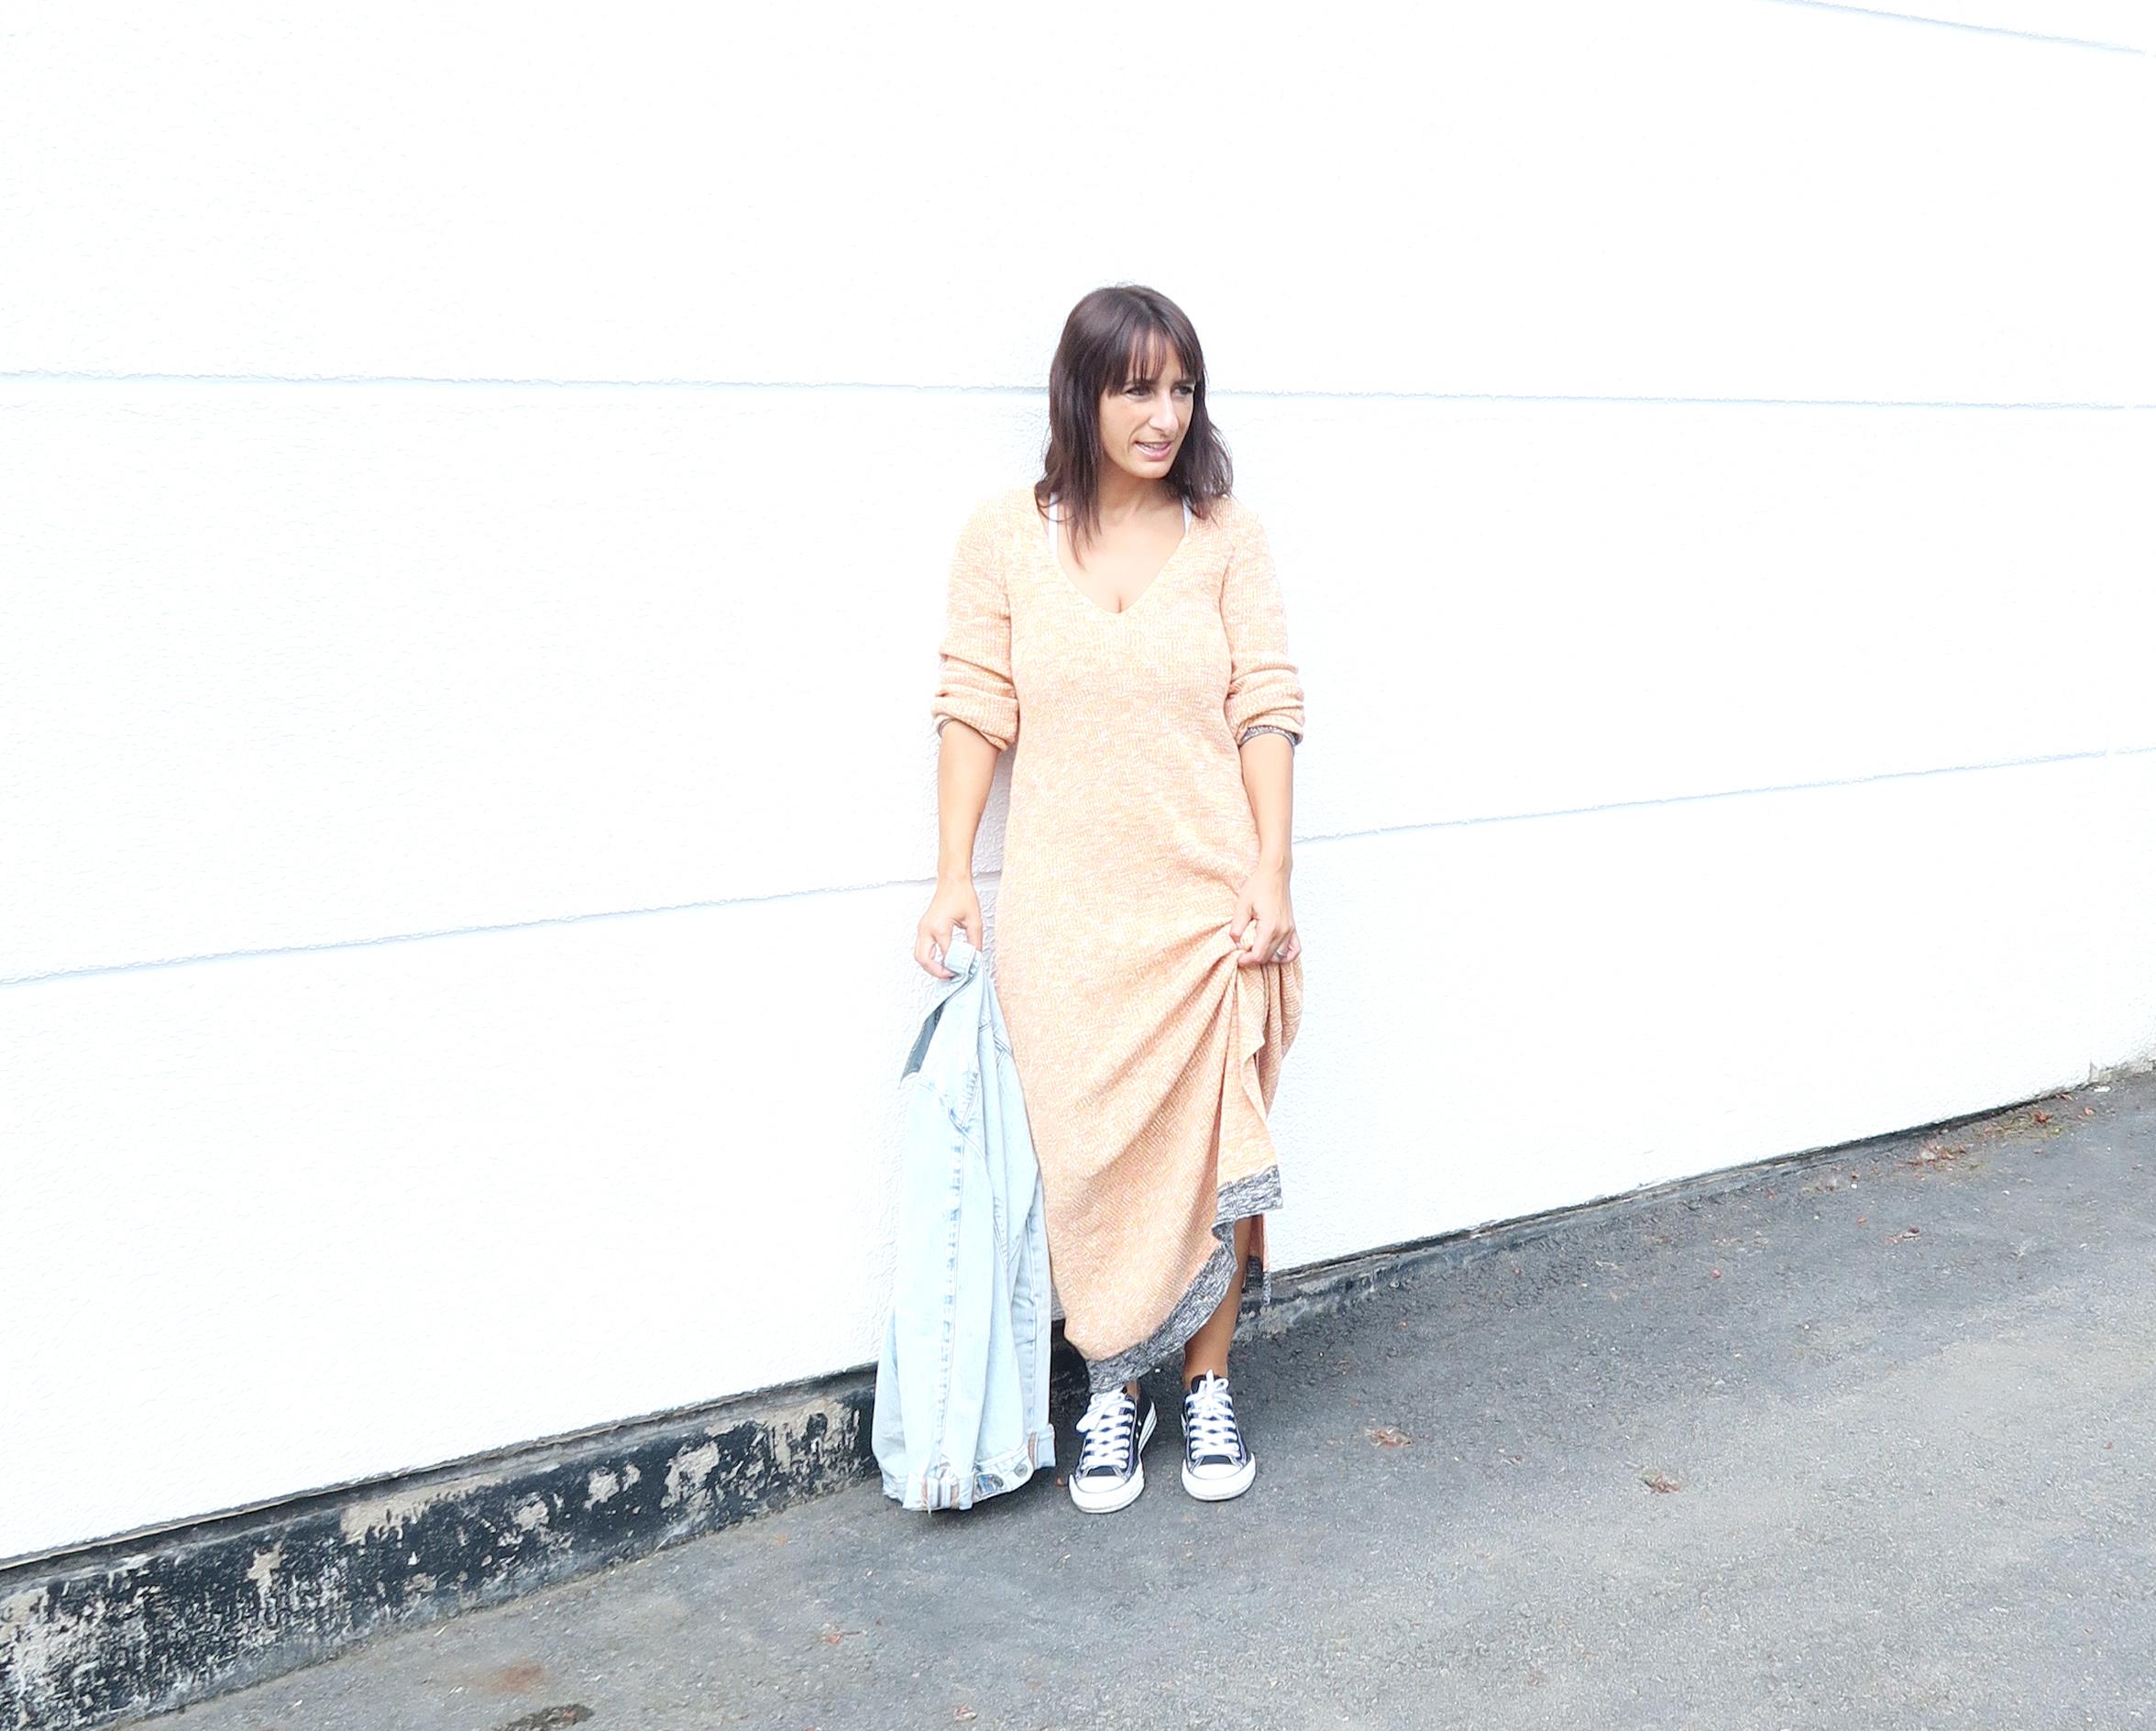 Modesalat-Blogger-Fashionblogger-Modeblogger-Streetstyle-Dress-Converse-5